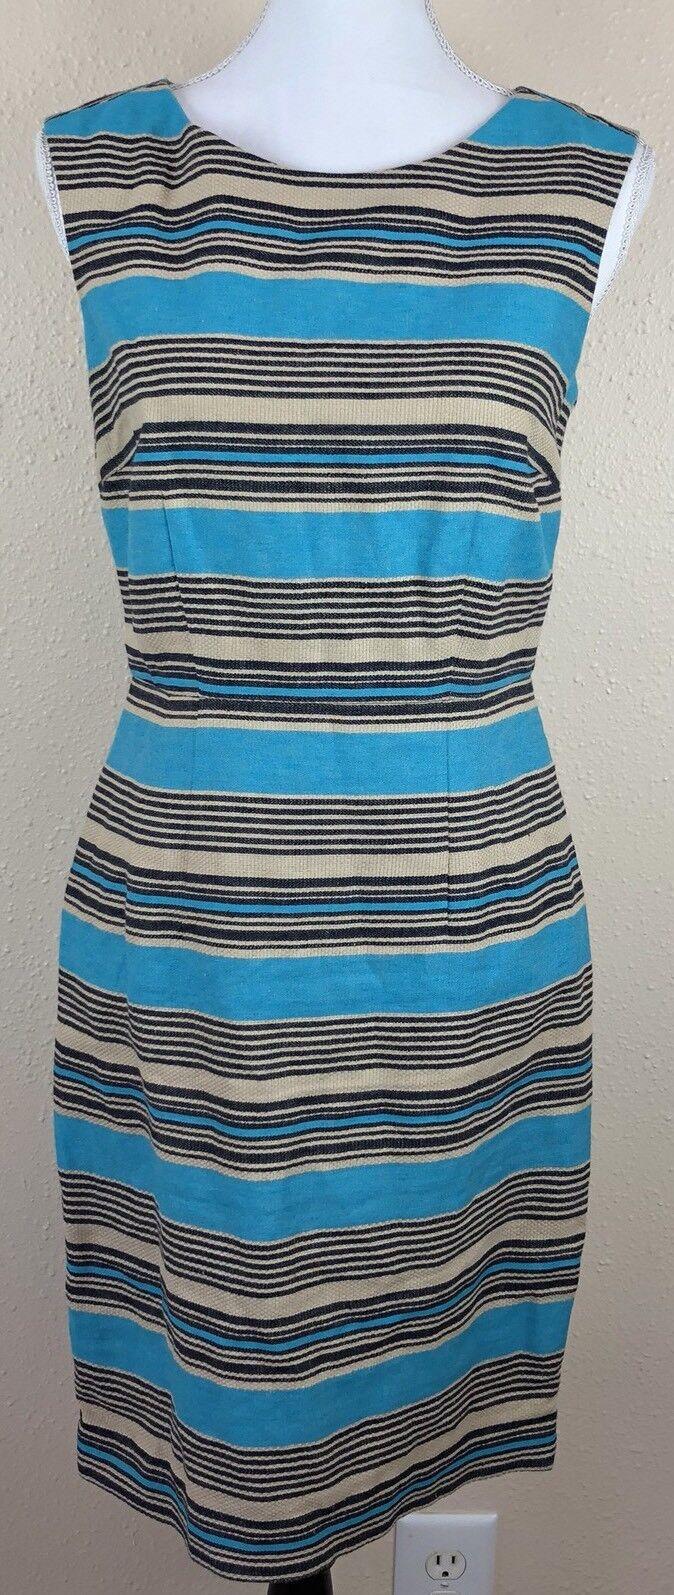 The Limited Blue Tan Striped Sleeveless Sheath Dress Linen Blend Career Work 2